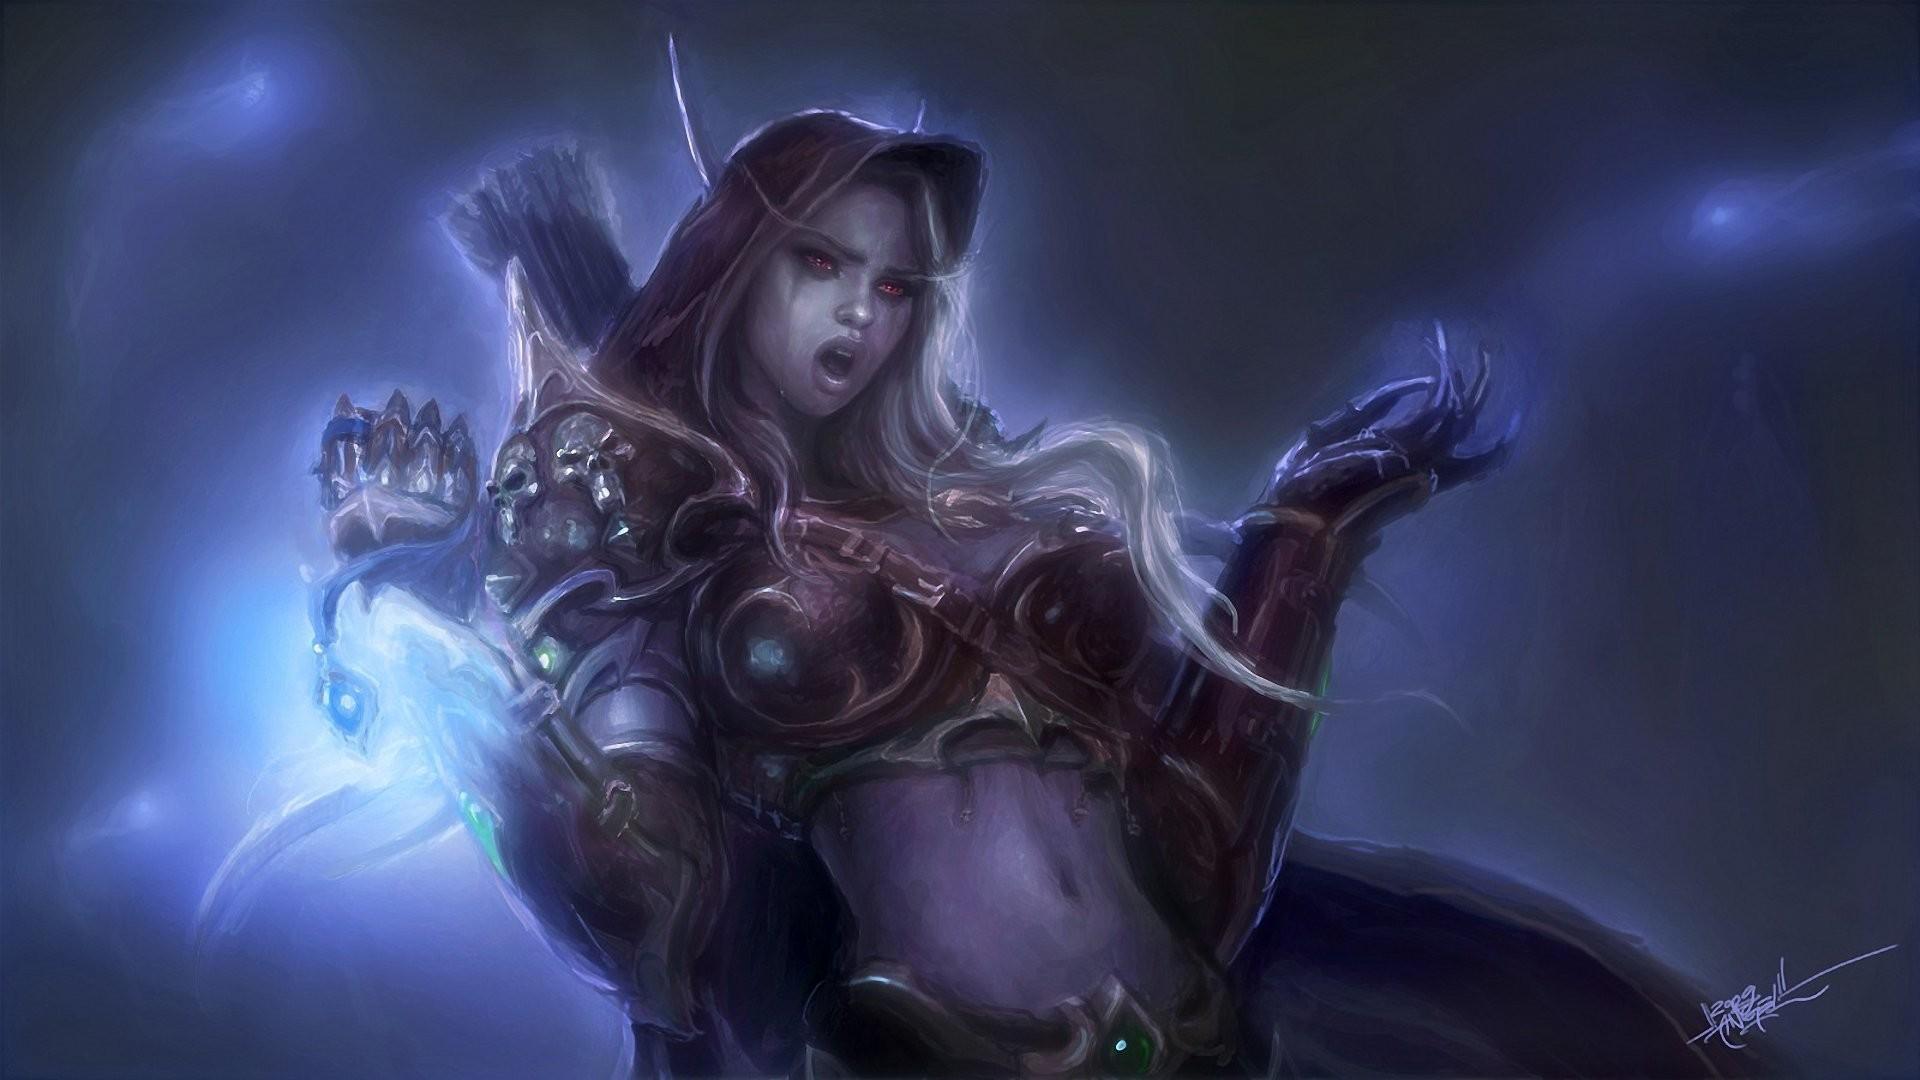 world of warcraft wow lady sylvanas windrunner elf armour magic boom tears